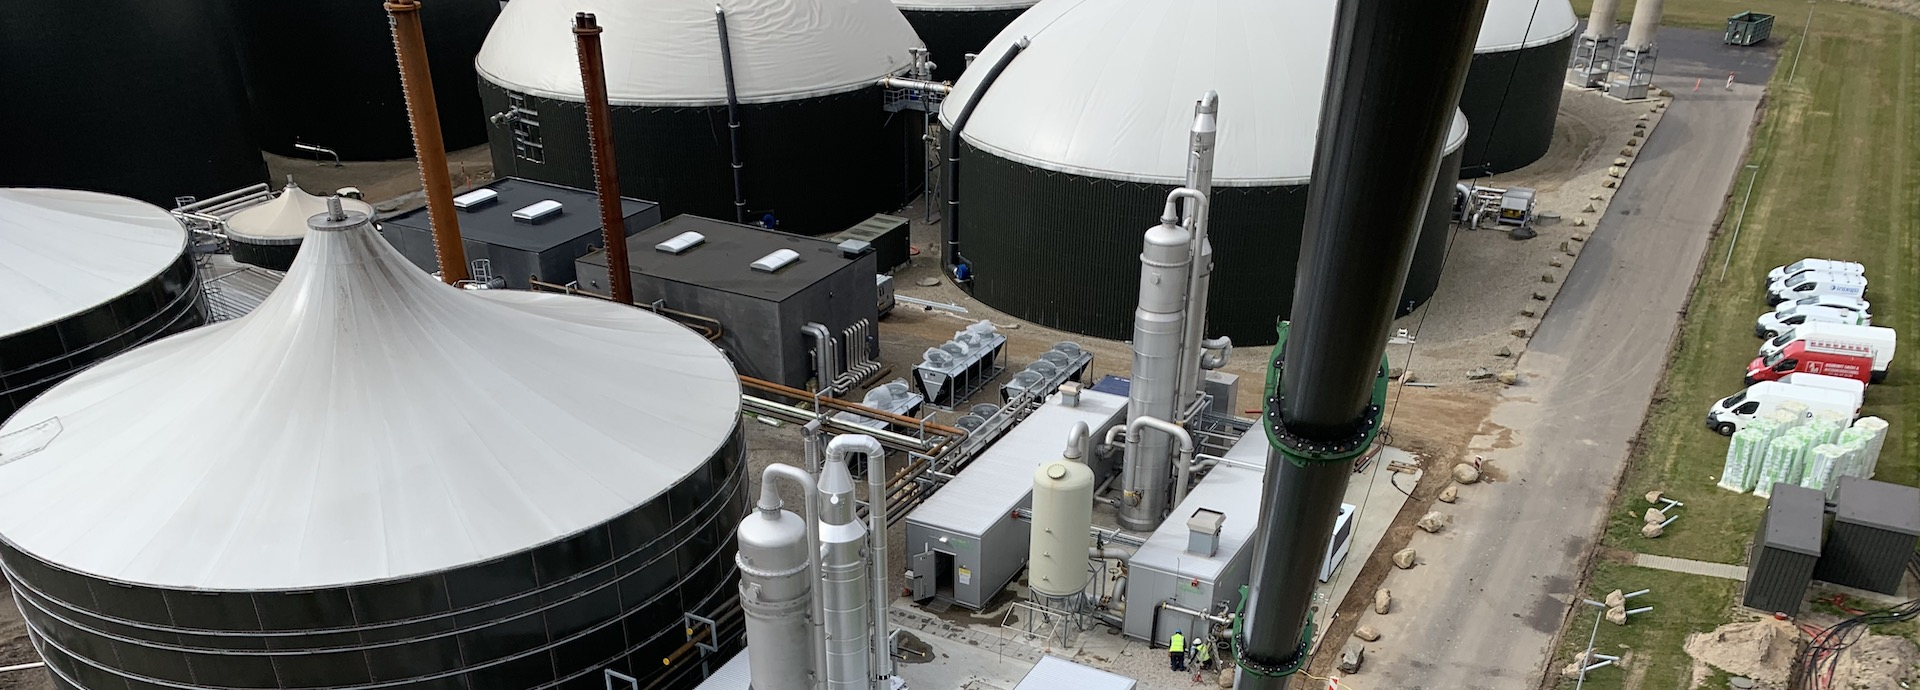 The Wärtsilä biogas polishing and liquefaction units at Tekniska Verken (Linköping, Sweden) are utilising food waste and turning the produced biogas into bioLNG.